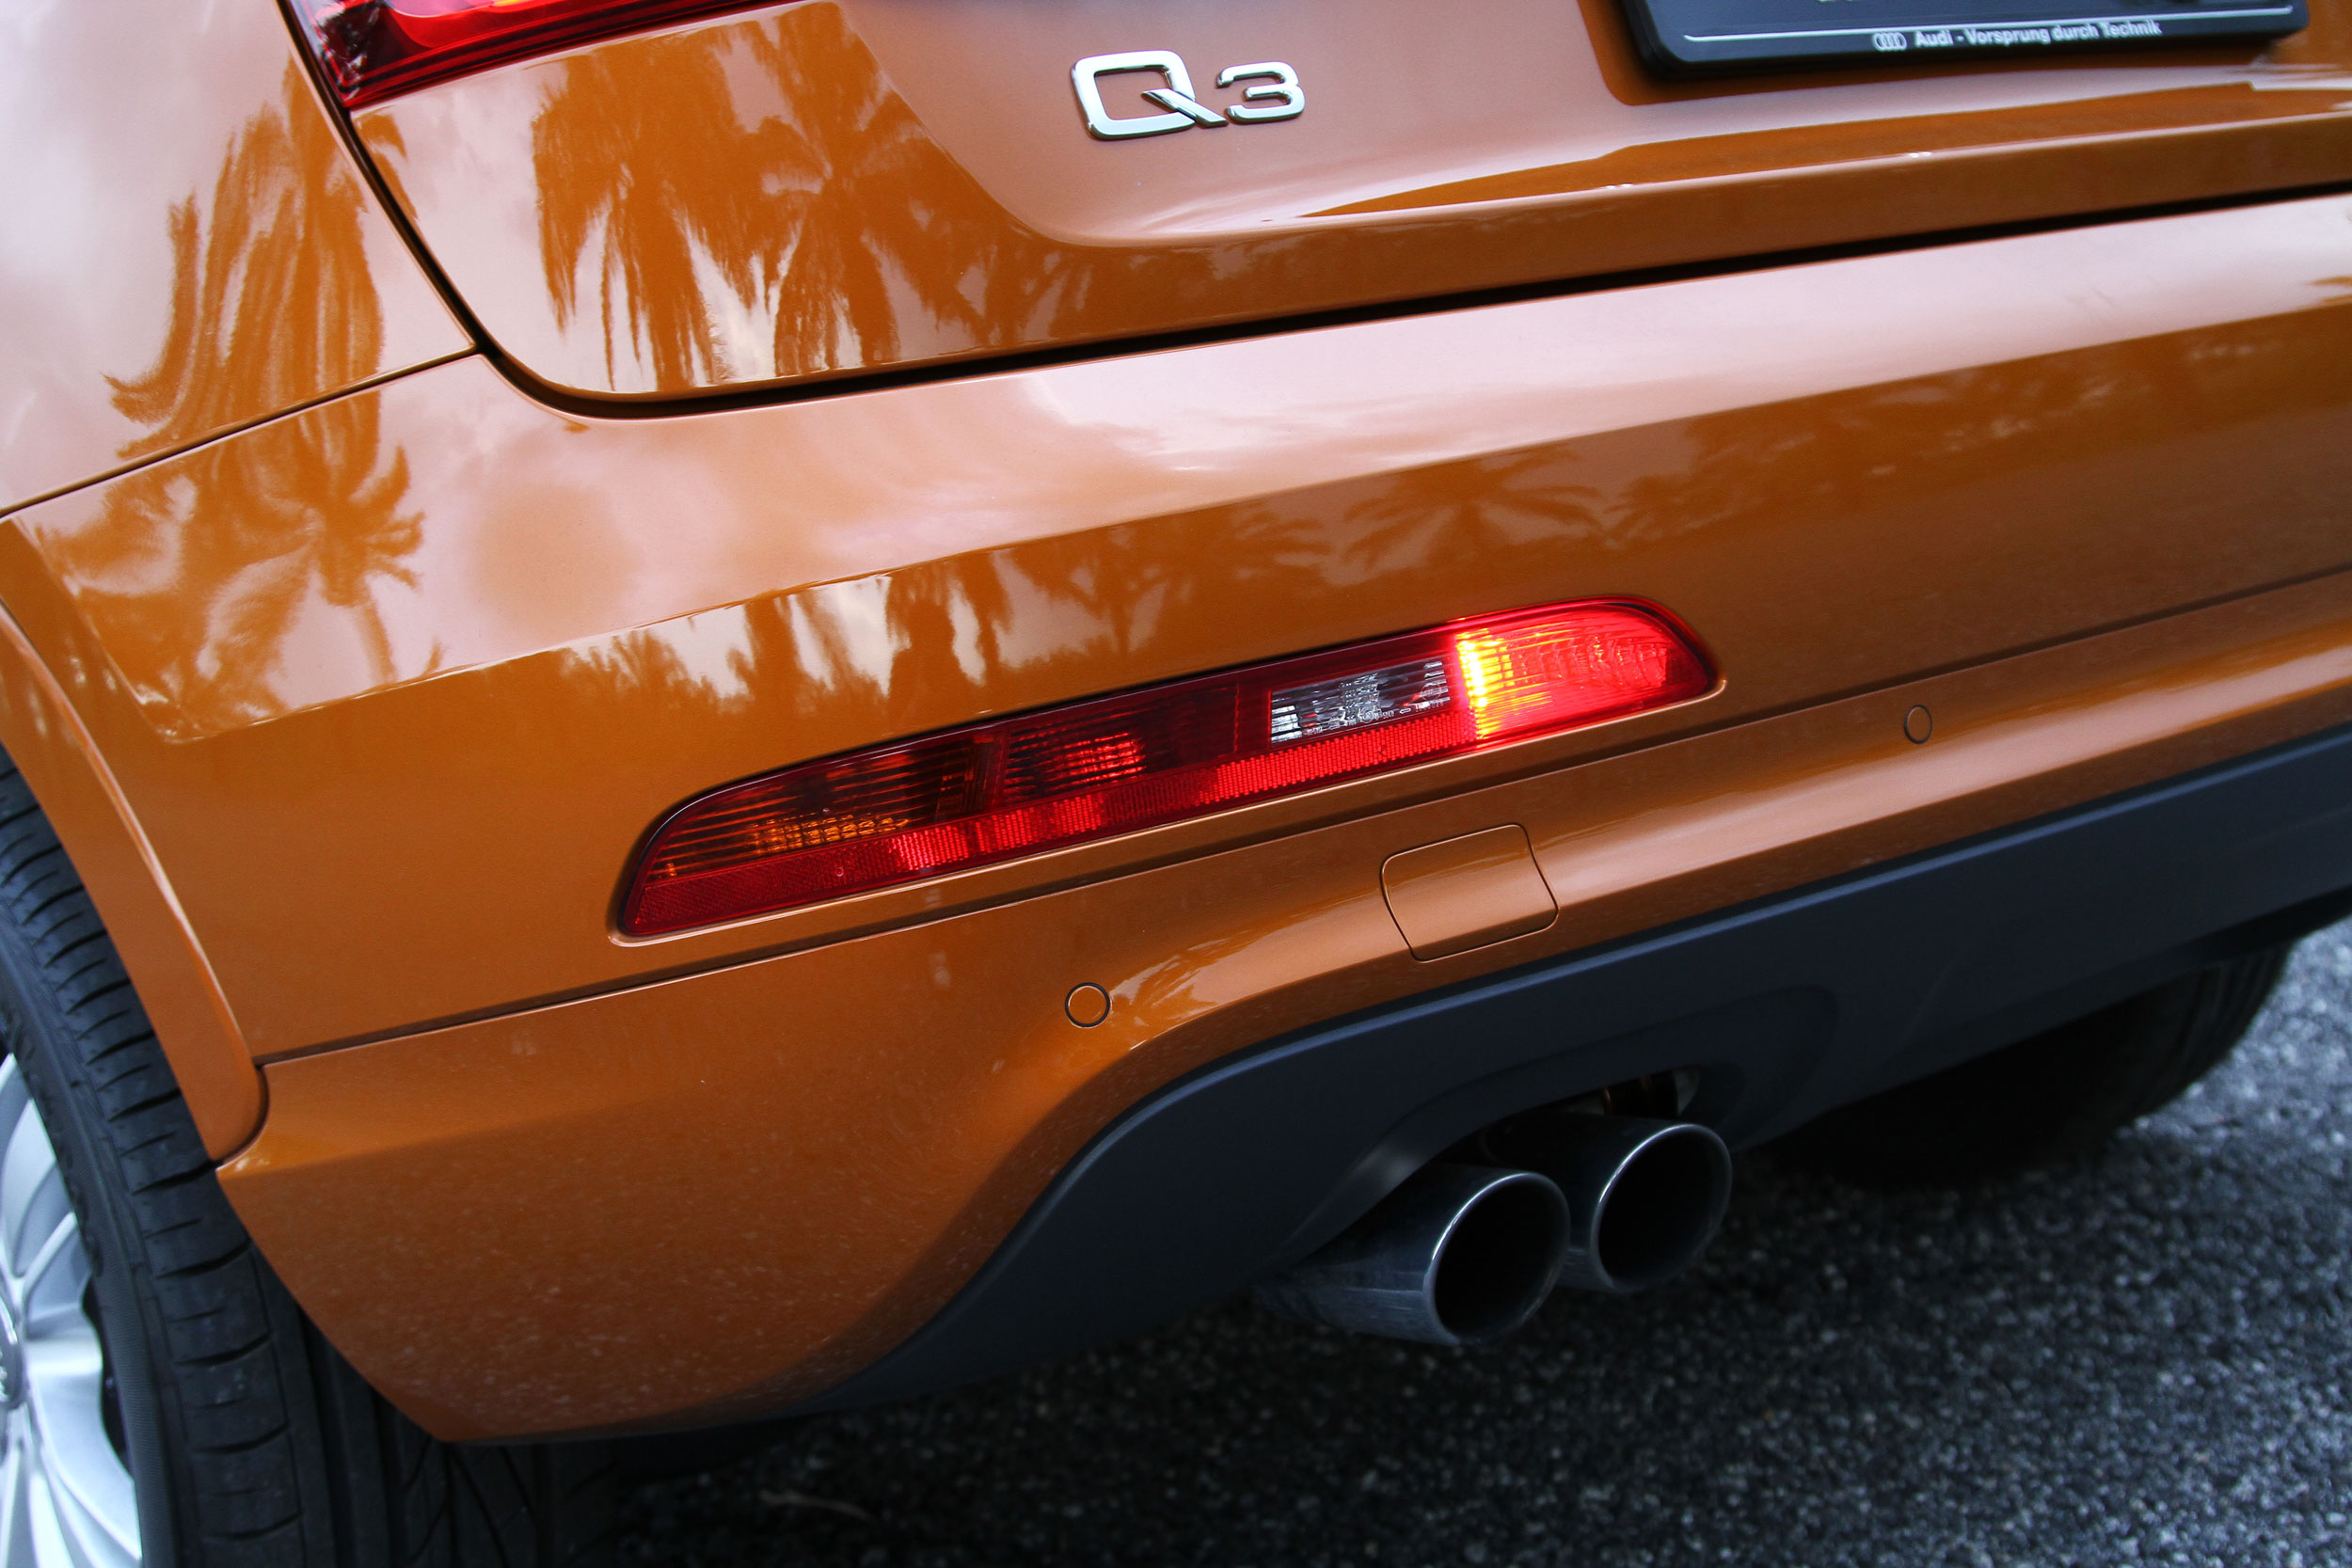 Audi Q3 2 0 Tfsi 170hp Test Drive Review Paul Tan Image